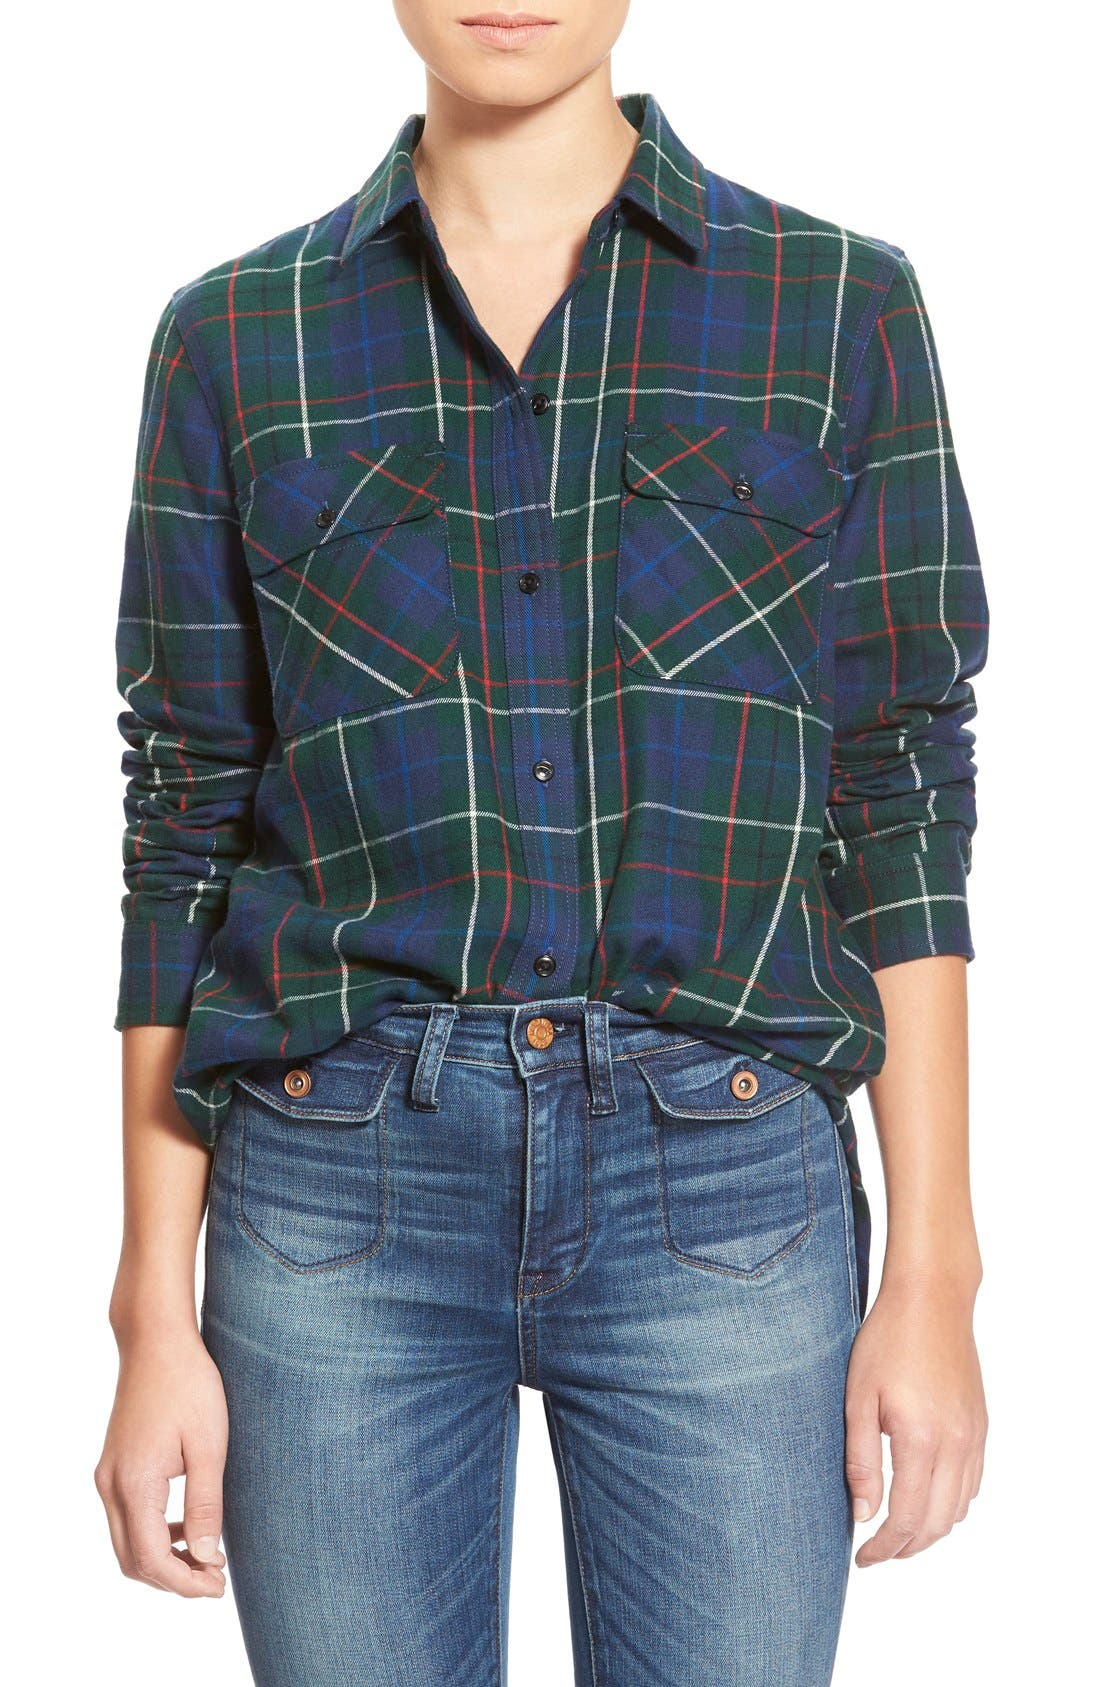 Main Image - Madewell Ex Boyfriend - Ontario Plaid Flannel Shirt